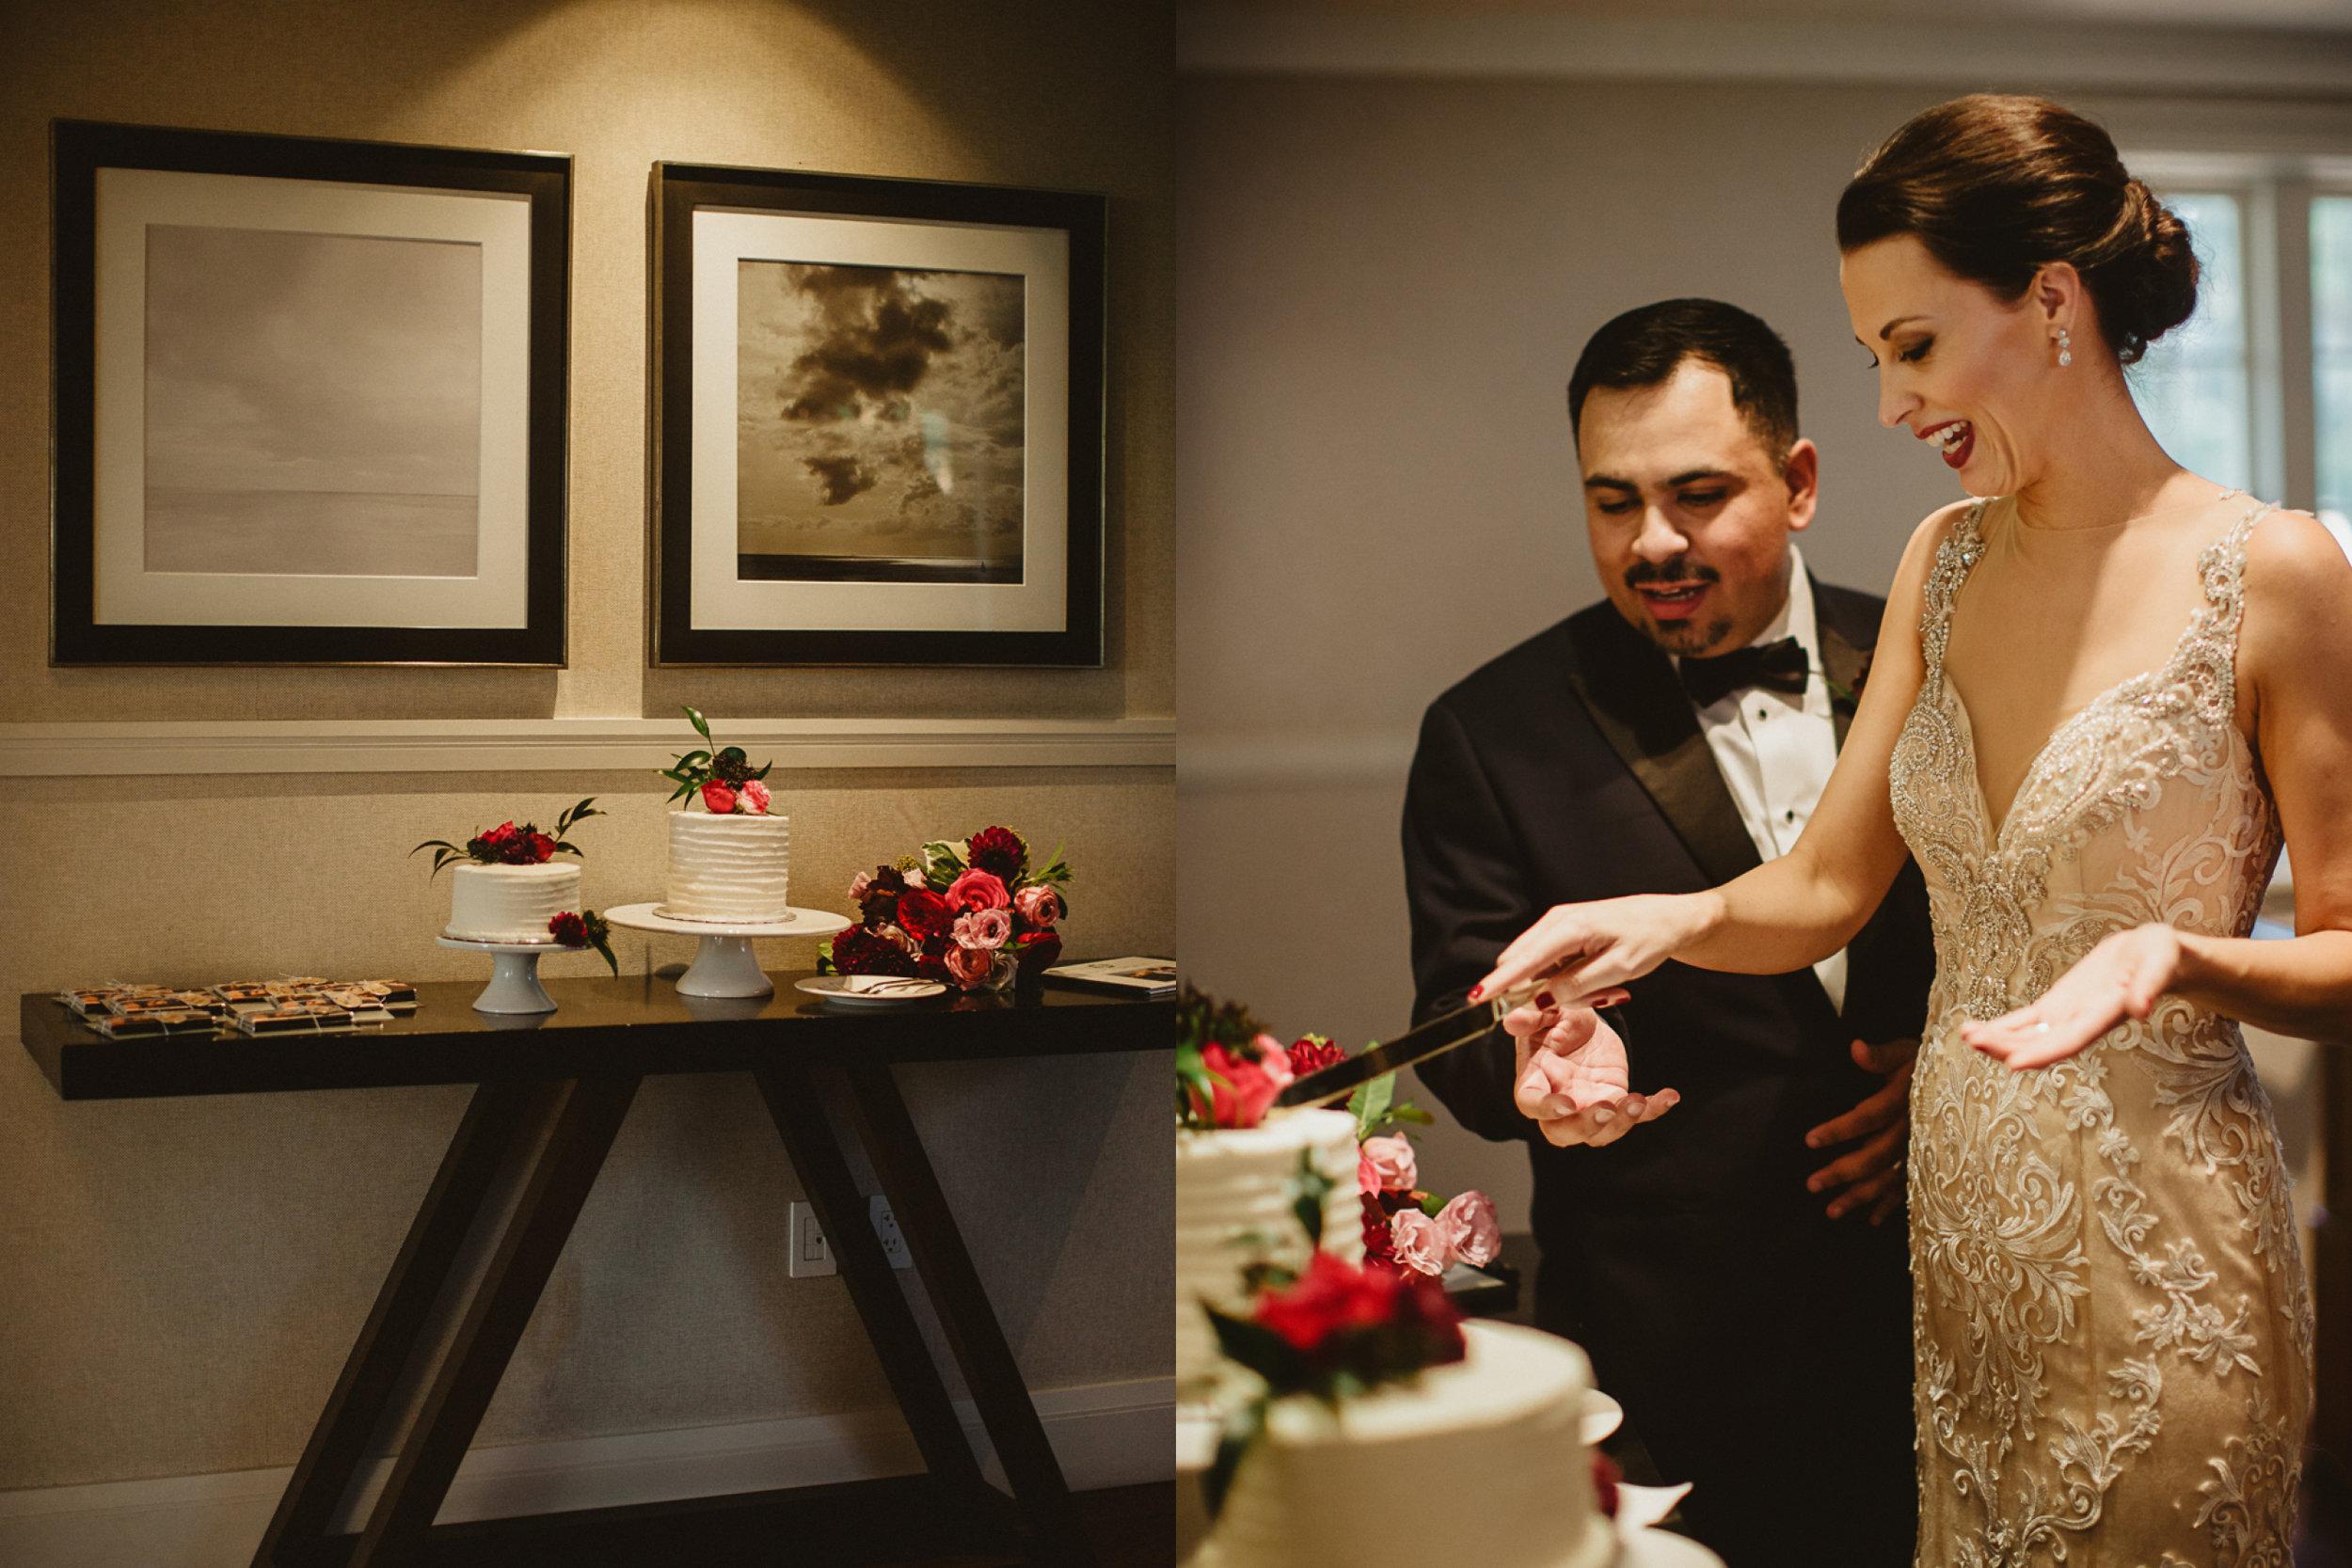 santa-barbara-elopement-elope-alegria-design-event-planner-coordinator-day-of-el-encanto-resort-lily-pond-wedding-intimate-red-maroon-city-ocean-view-rooftop (32).jpg